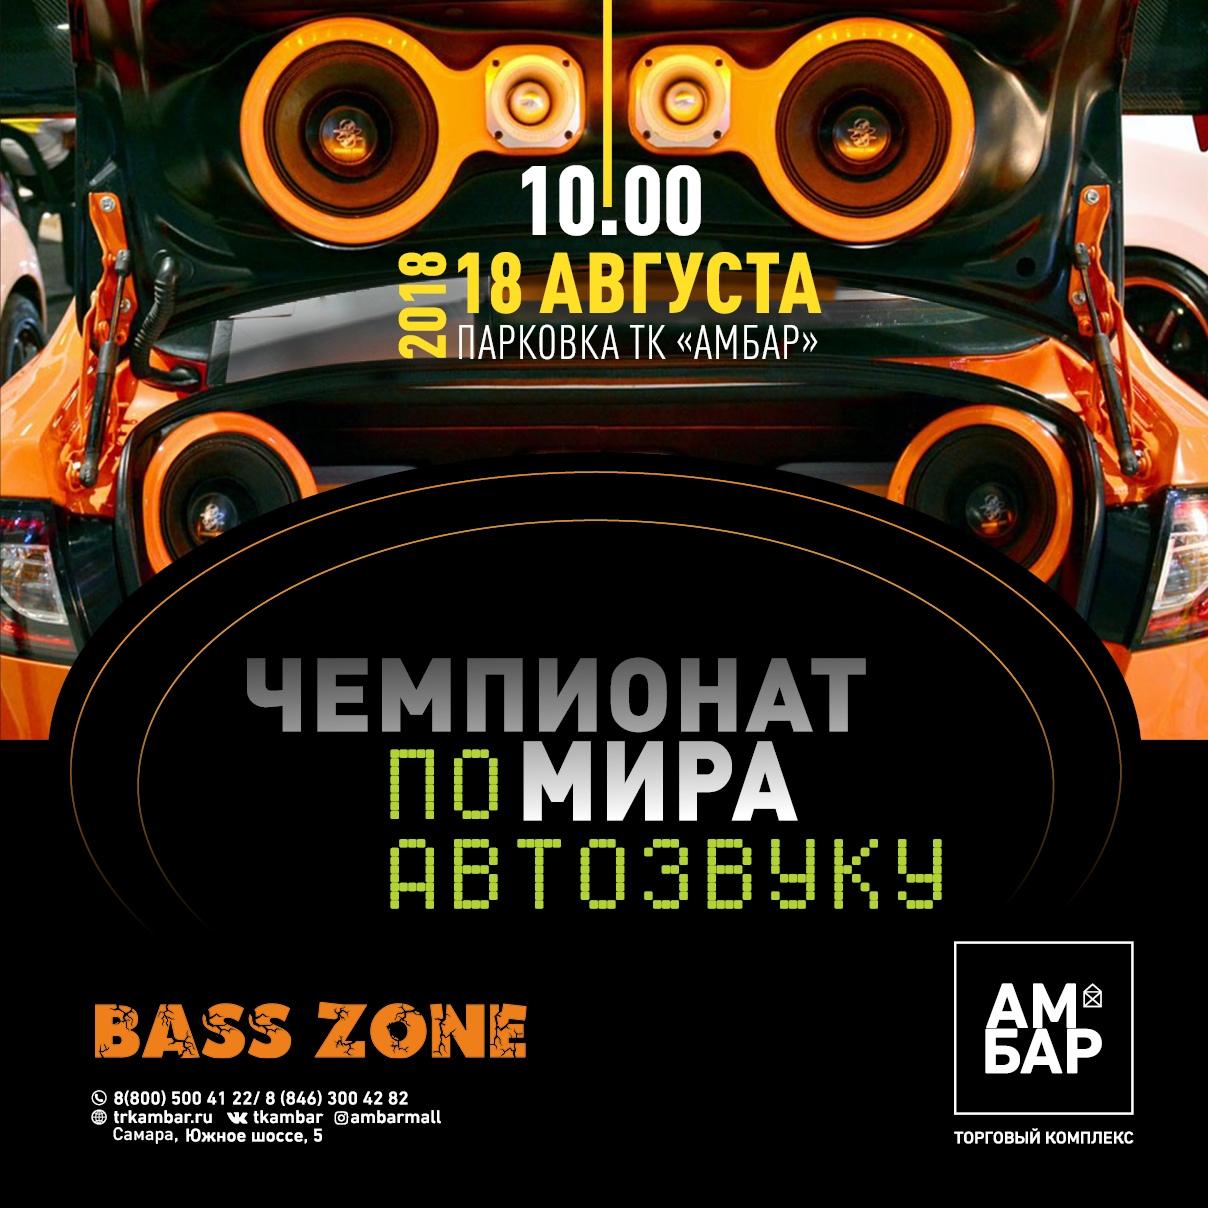 Bass Zone